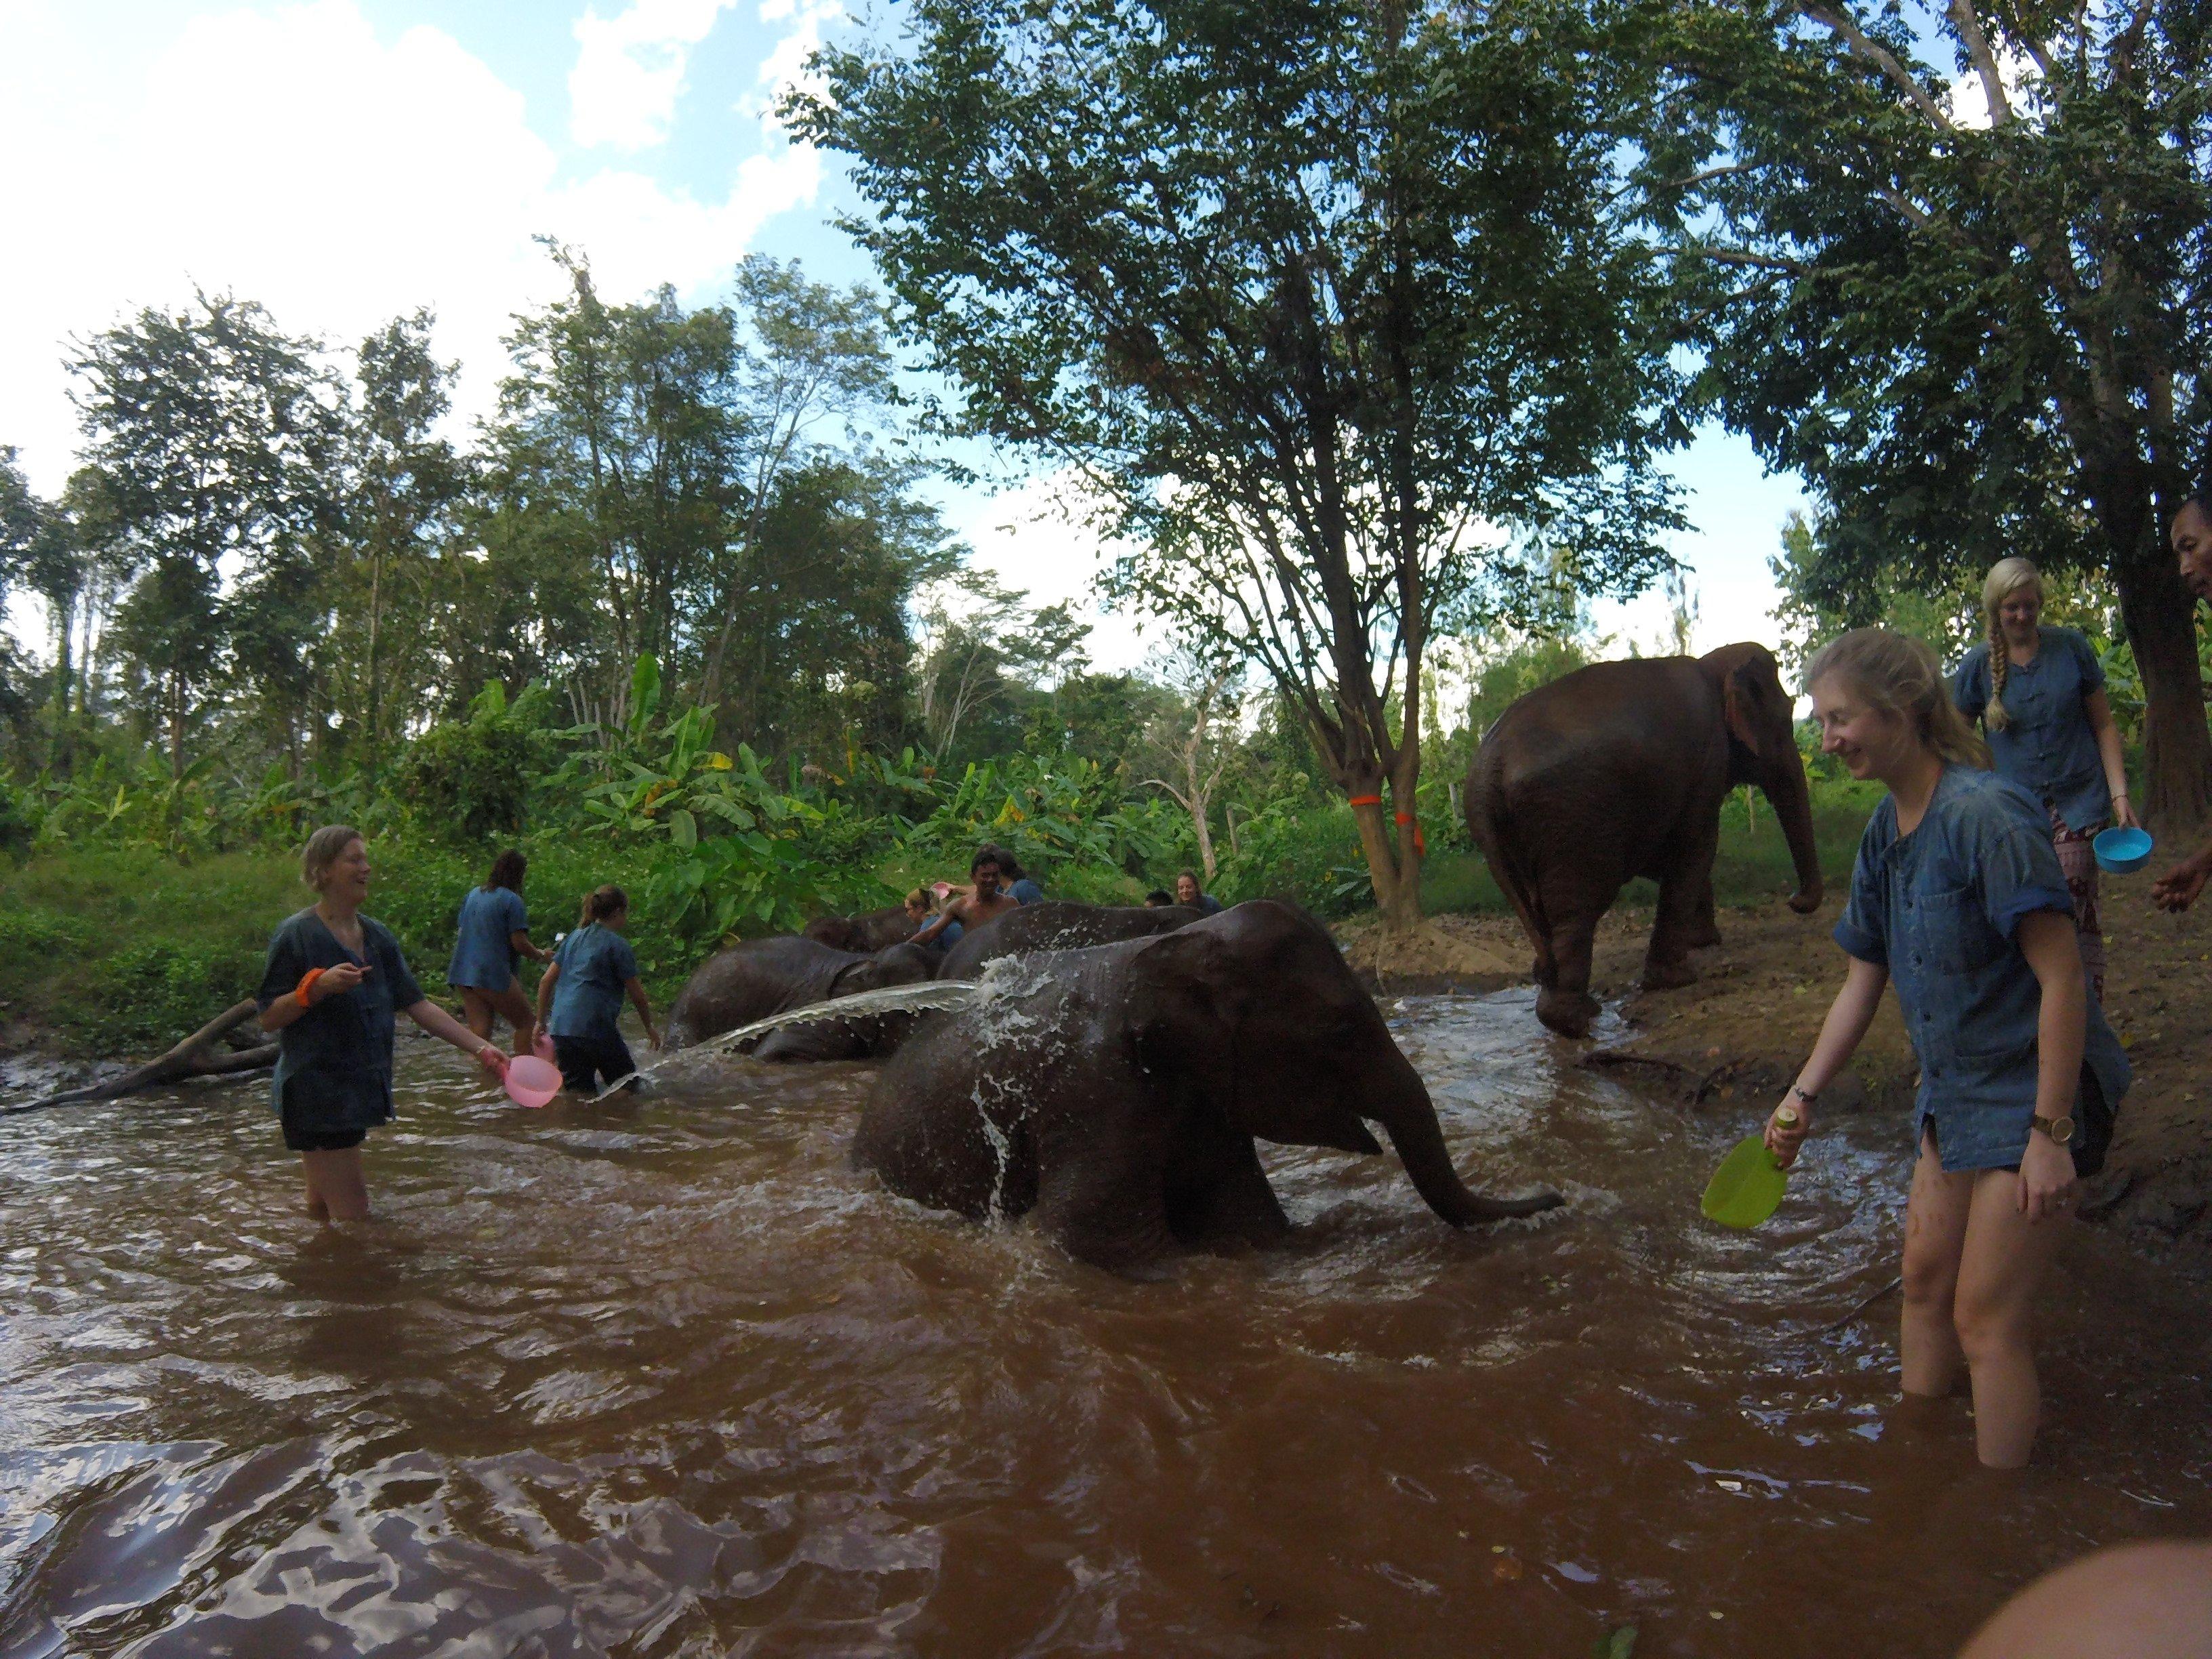 Baden met de olifanten - excursie via Elephant Nature Park Chiang Mai